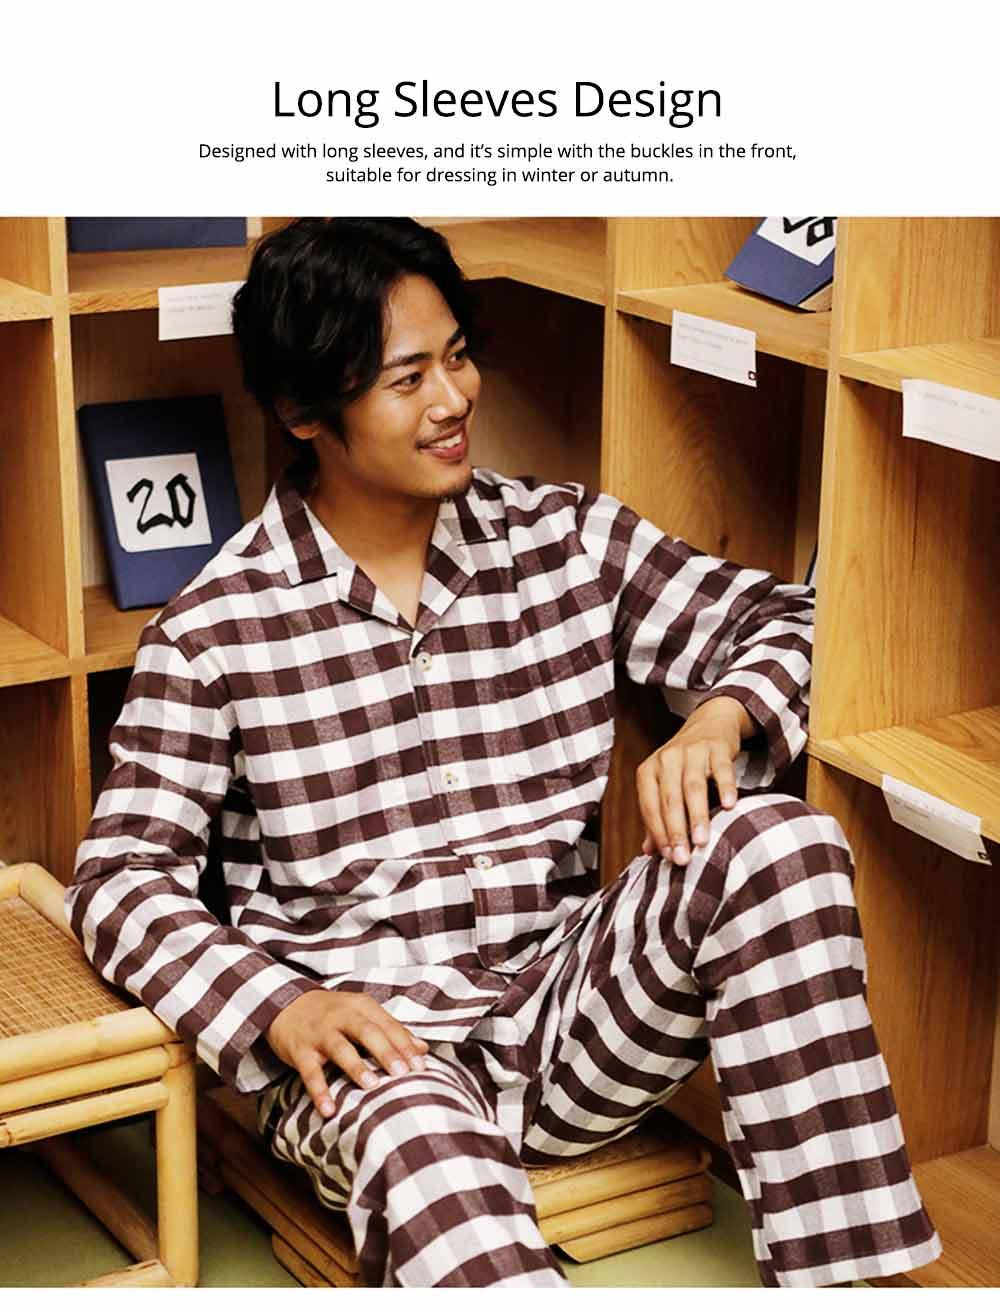 Stripe Nightgown Comfortable Pajamas Set for Men Long Sleeves Cotton Sleepwear Autumn Winter 7